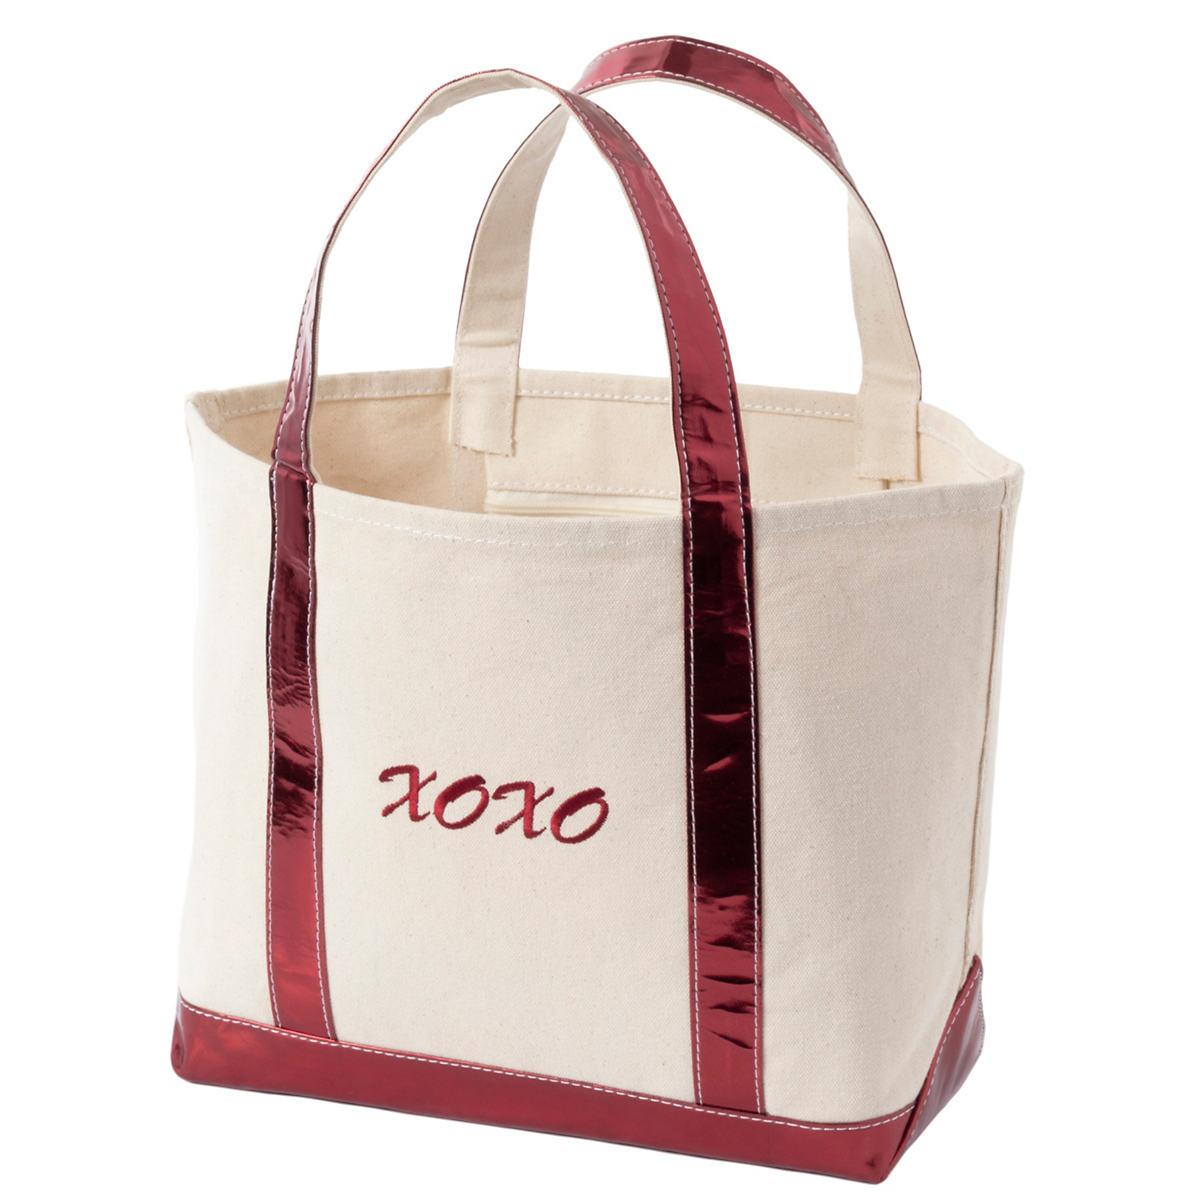 Xoxo Glam Canvas Natural/Cranberry Tote Bag